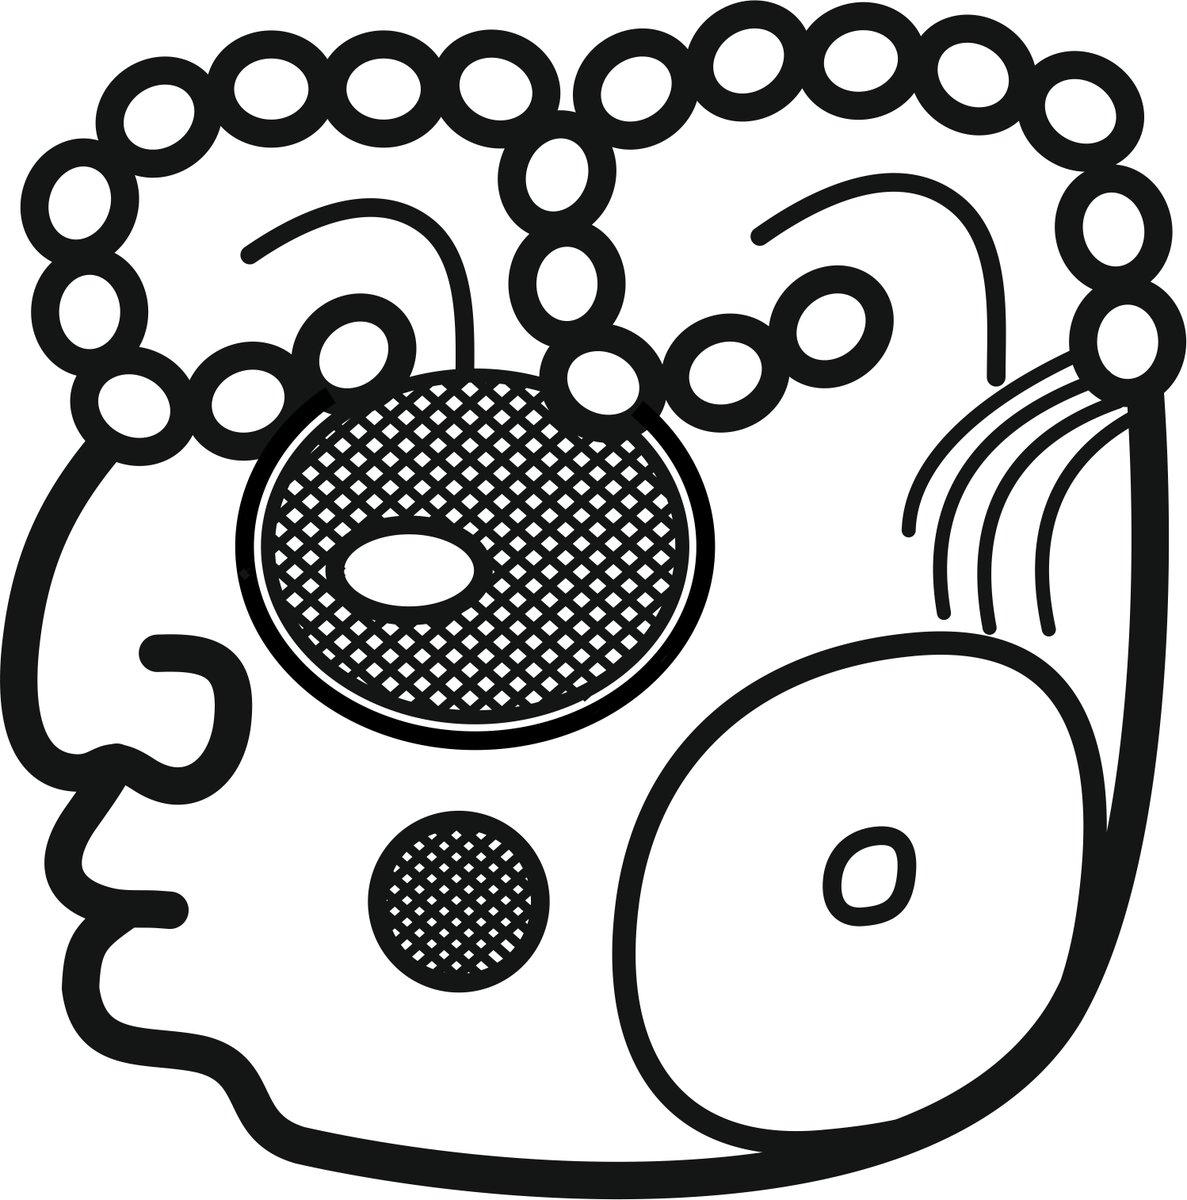 Christian Prager On Twitter Fun With Mayahieroglyphs An